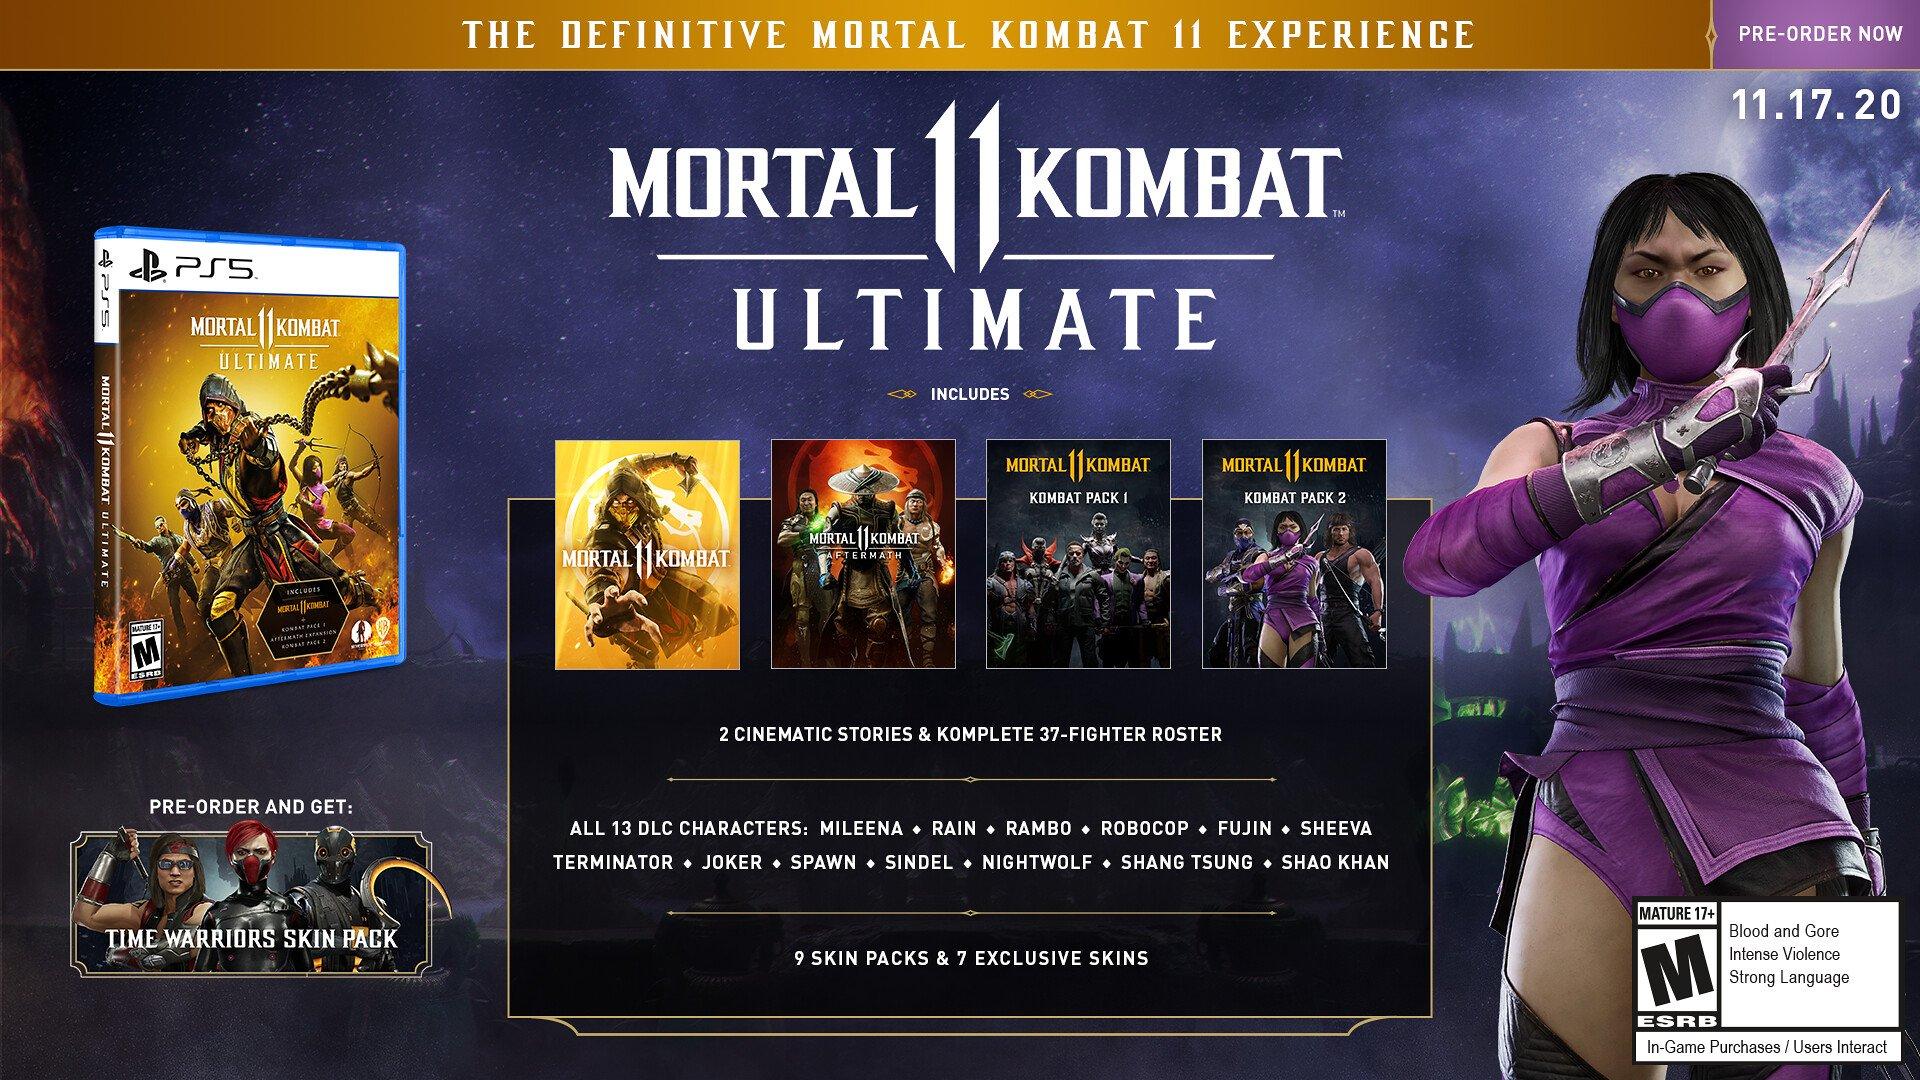 Mortal Kombat 11 Ultimate will be playable as Rambo TechRechard